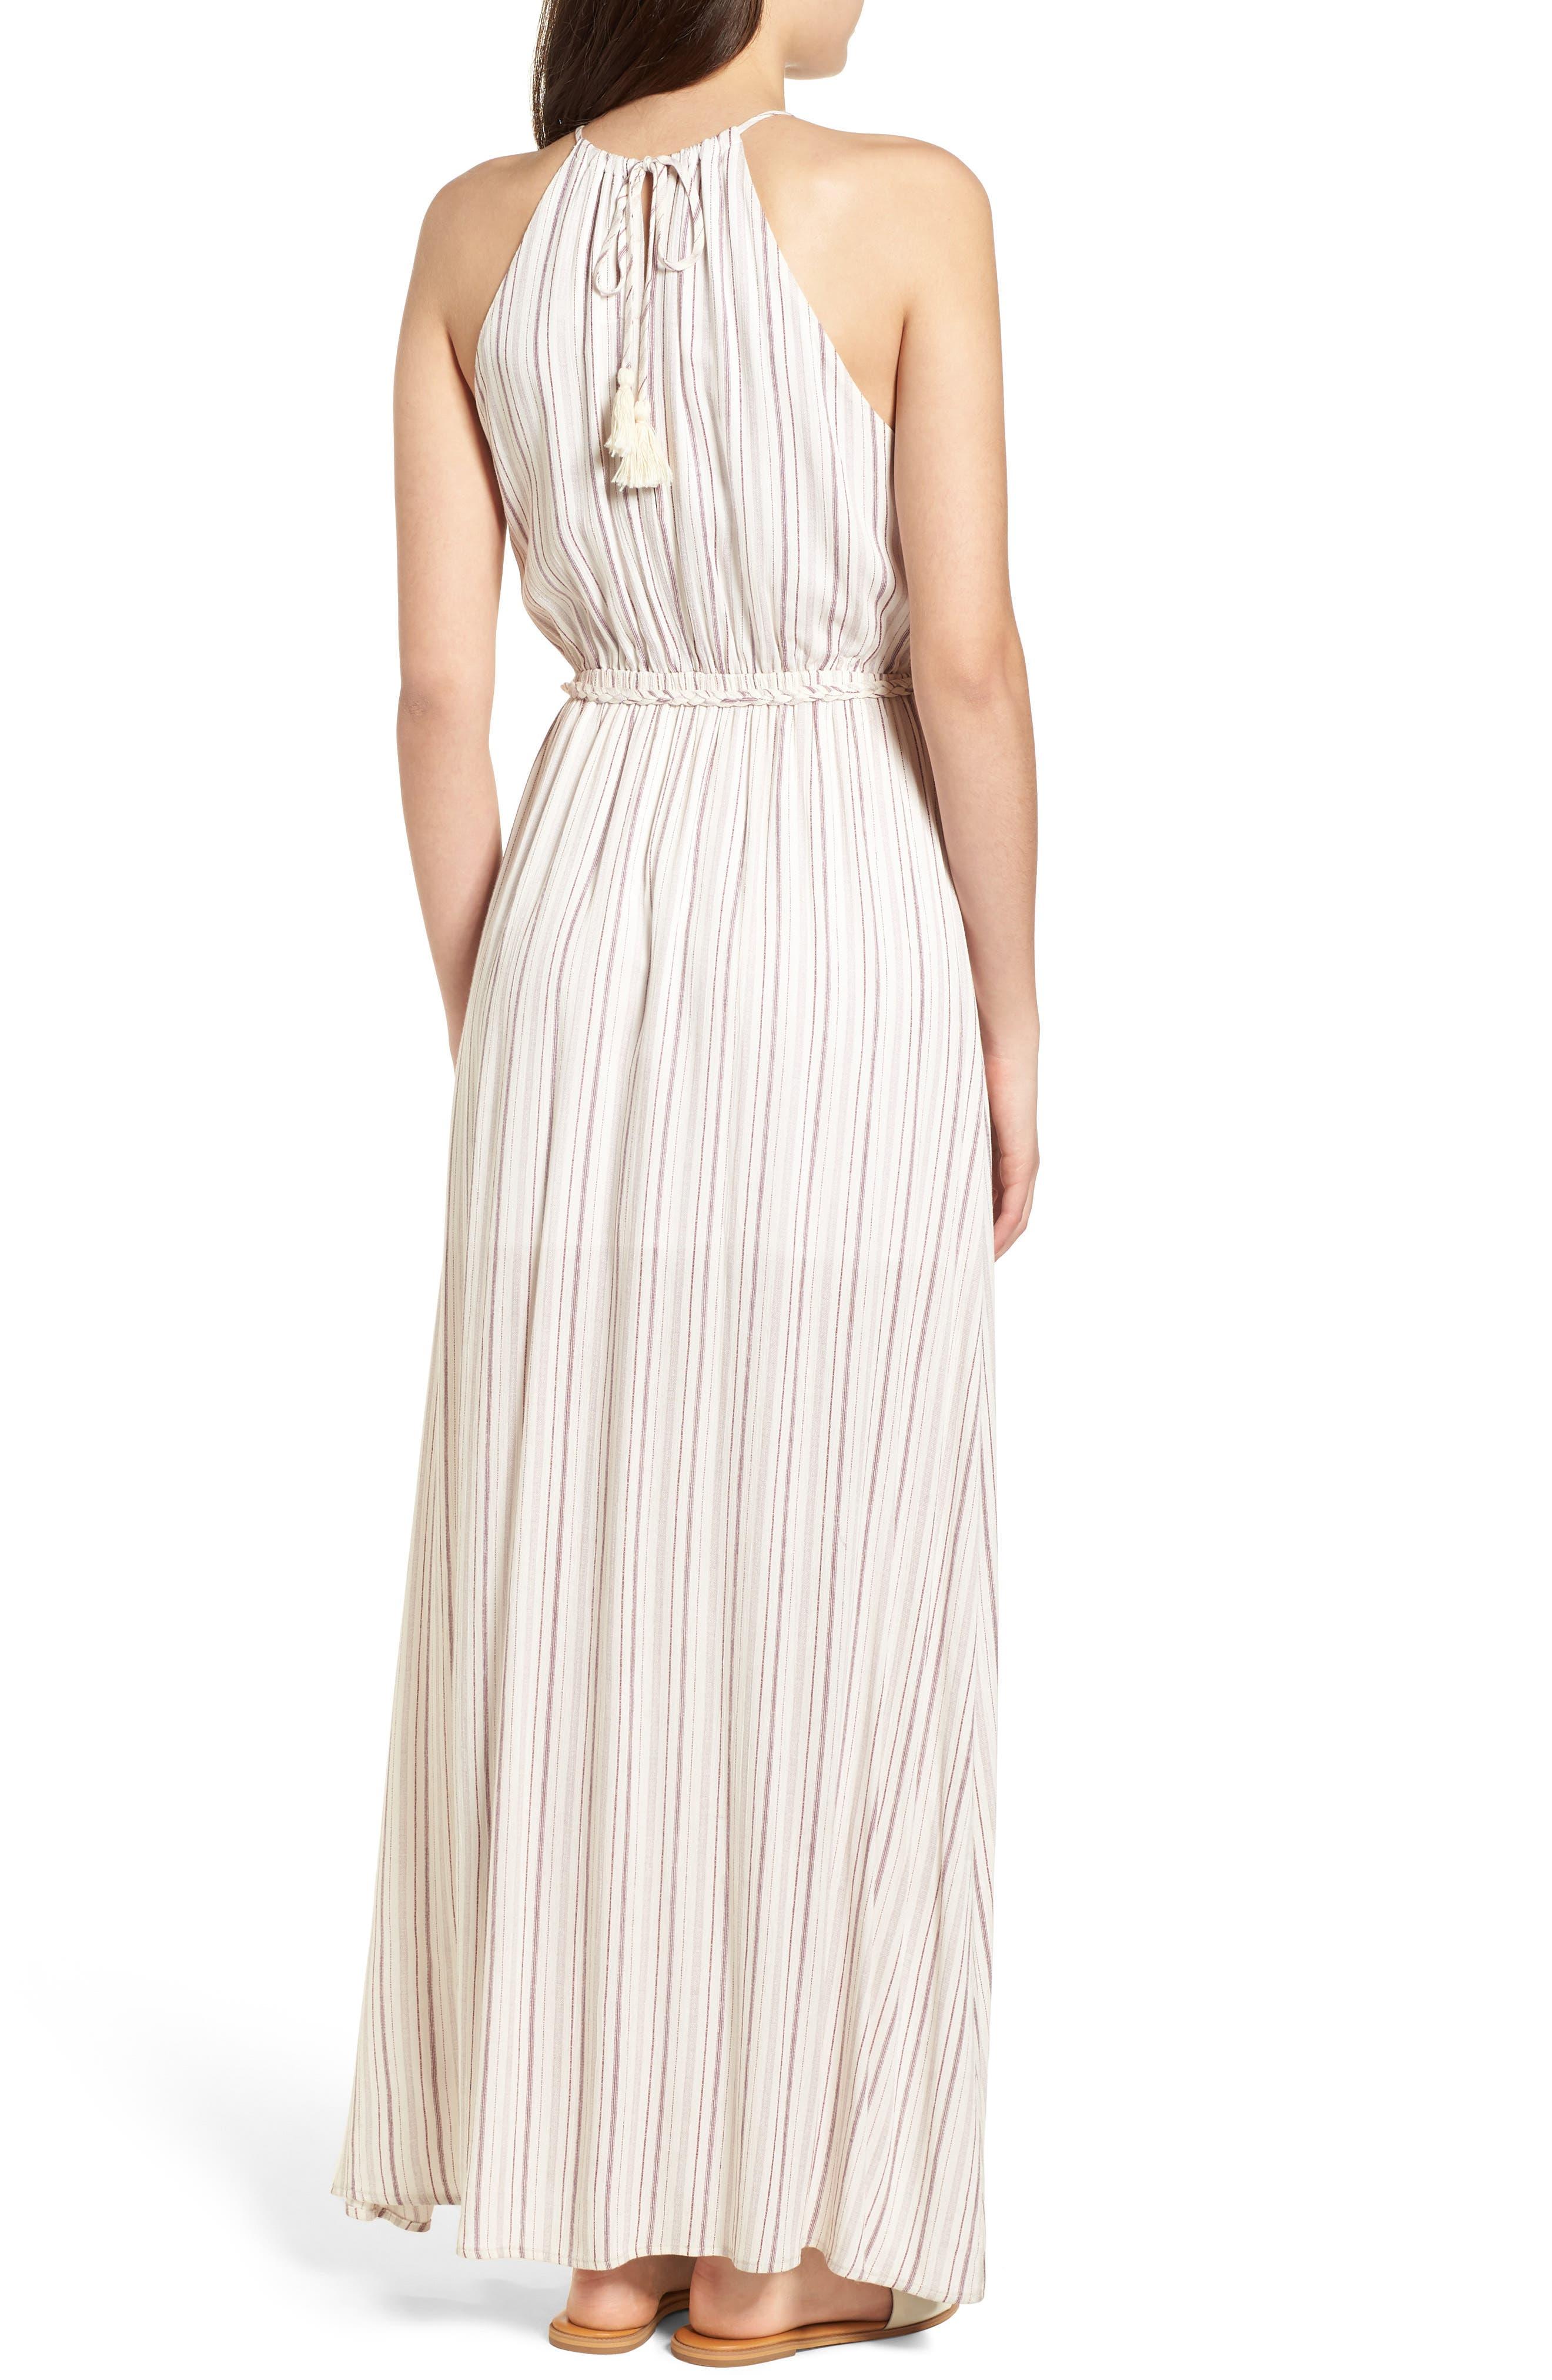 Daydreamer Stripe Maxi Dress,                             Alternate thumbnail 2, color,                             Ivory/ Mauve